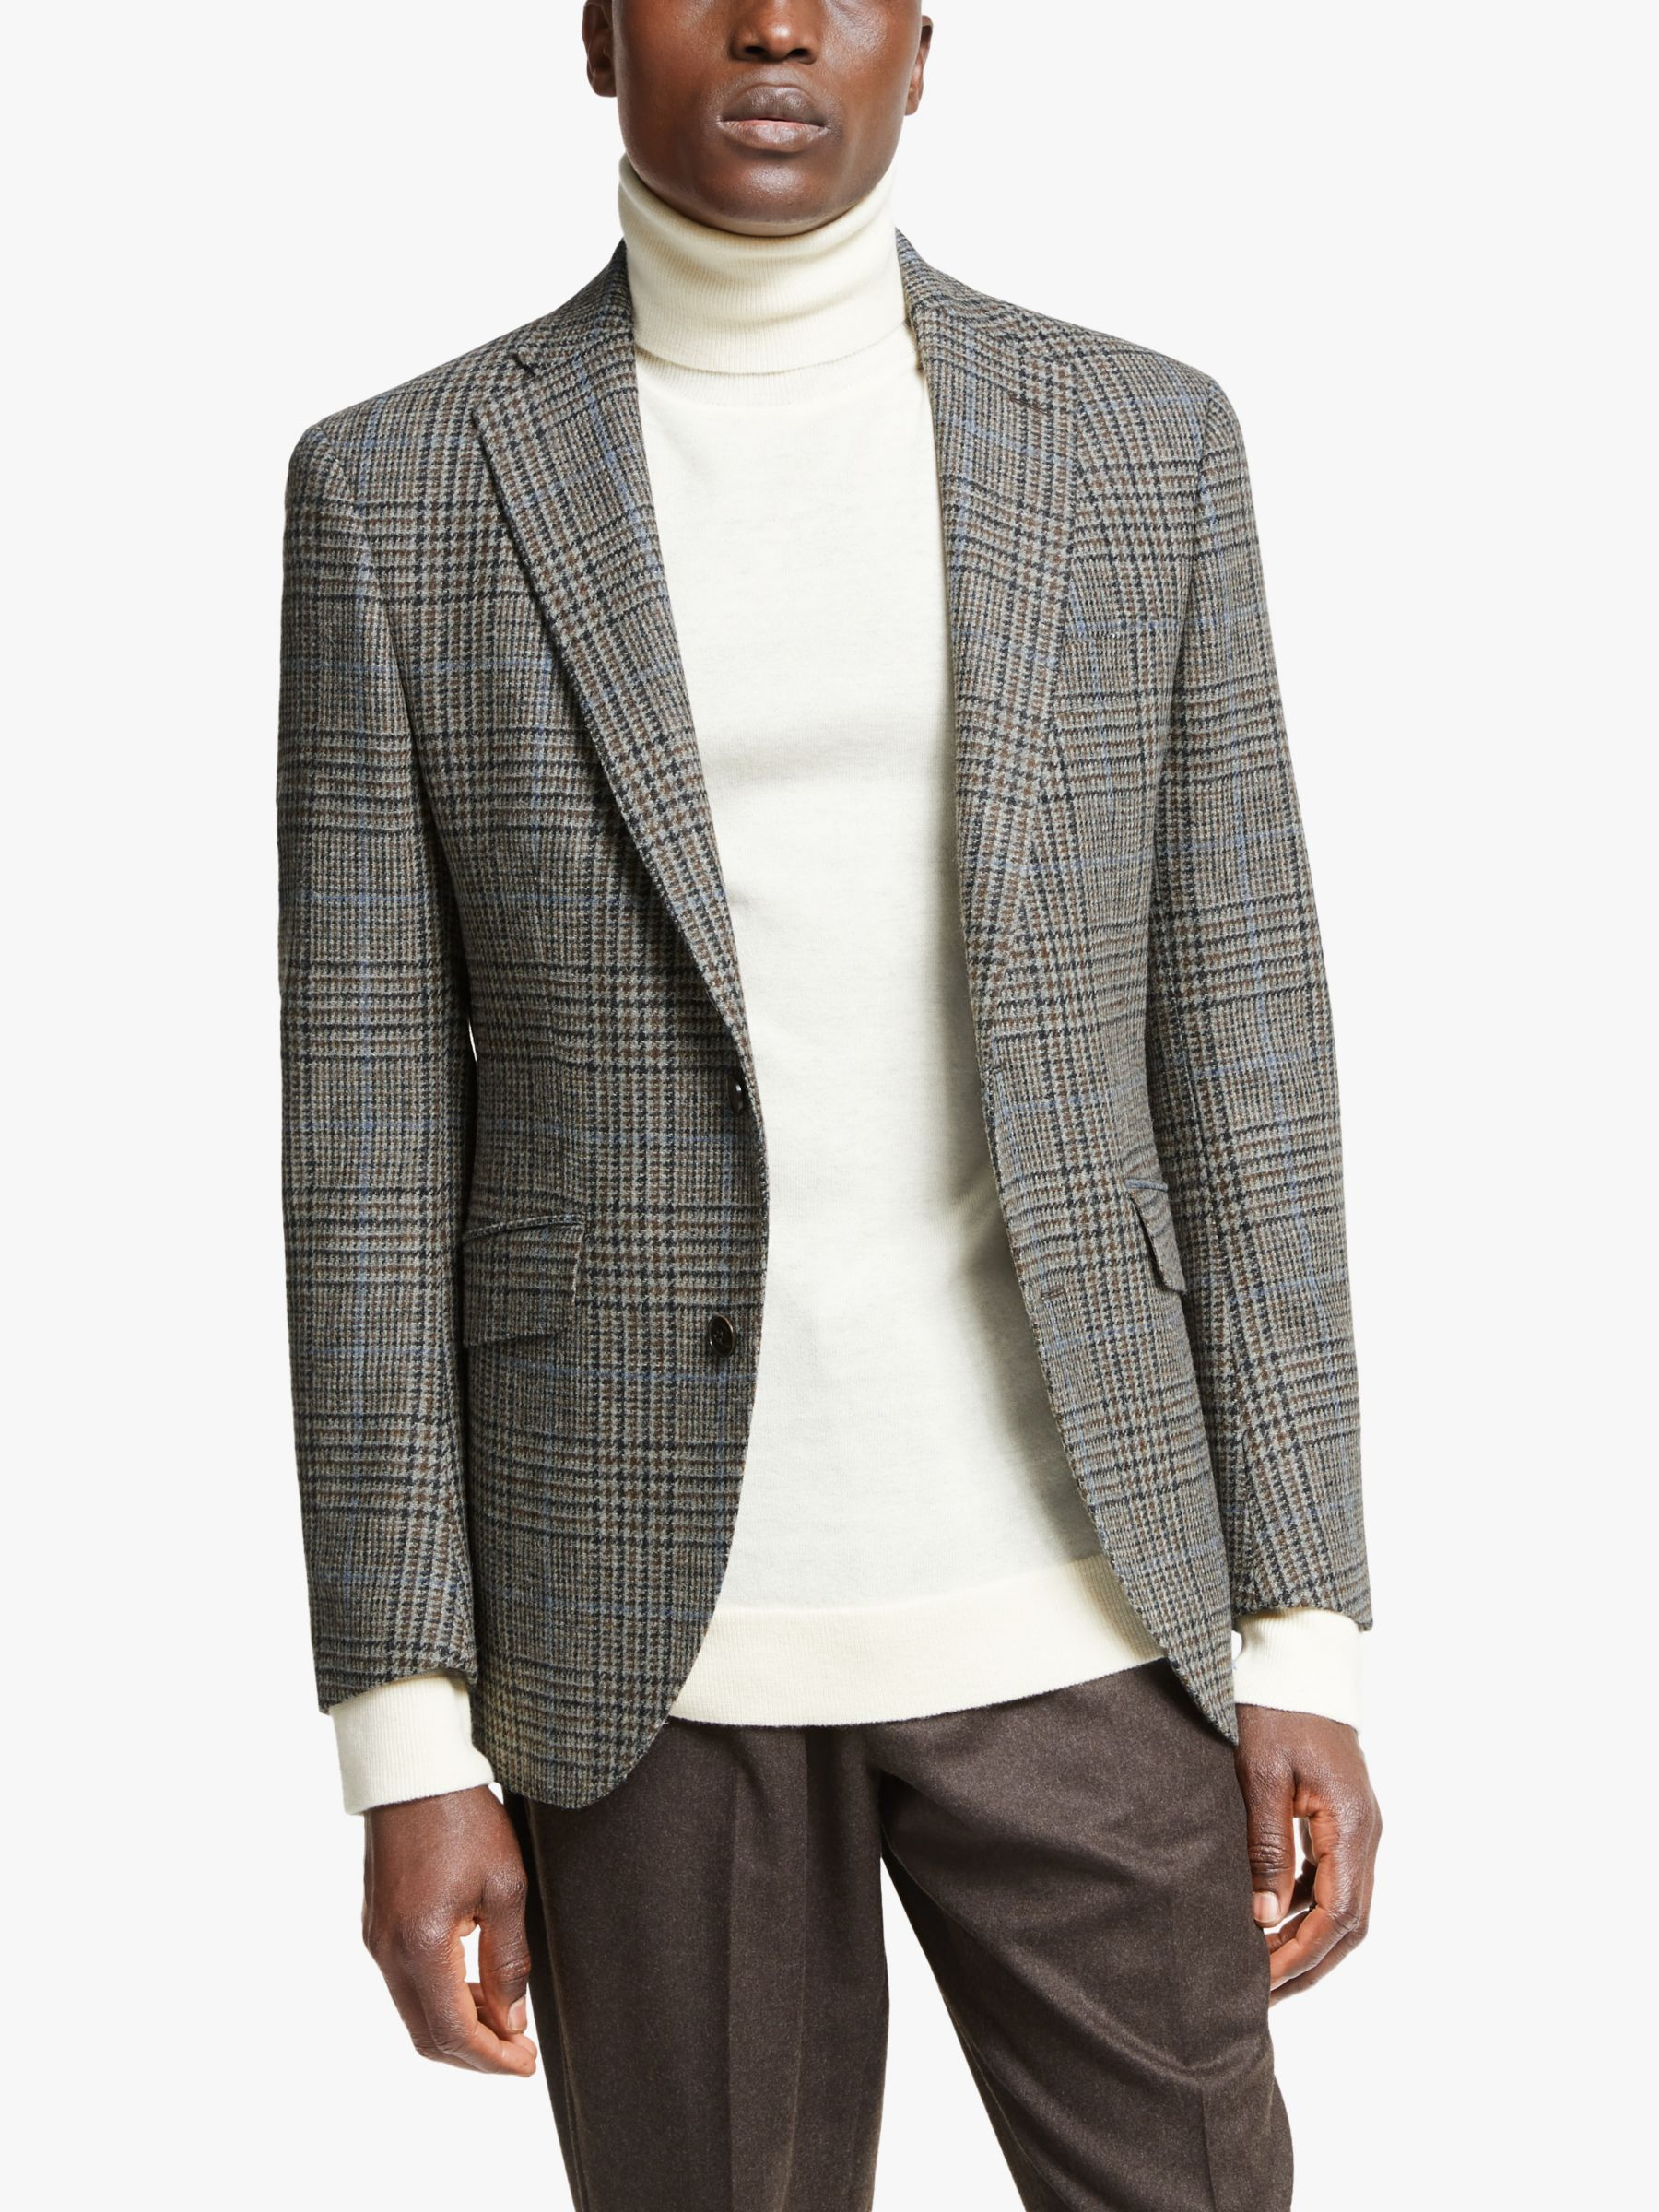 Hackett London Hackett London Wool Tweed Blazer, Brown/Grey